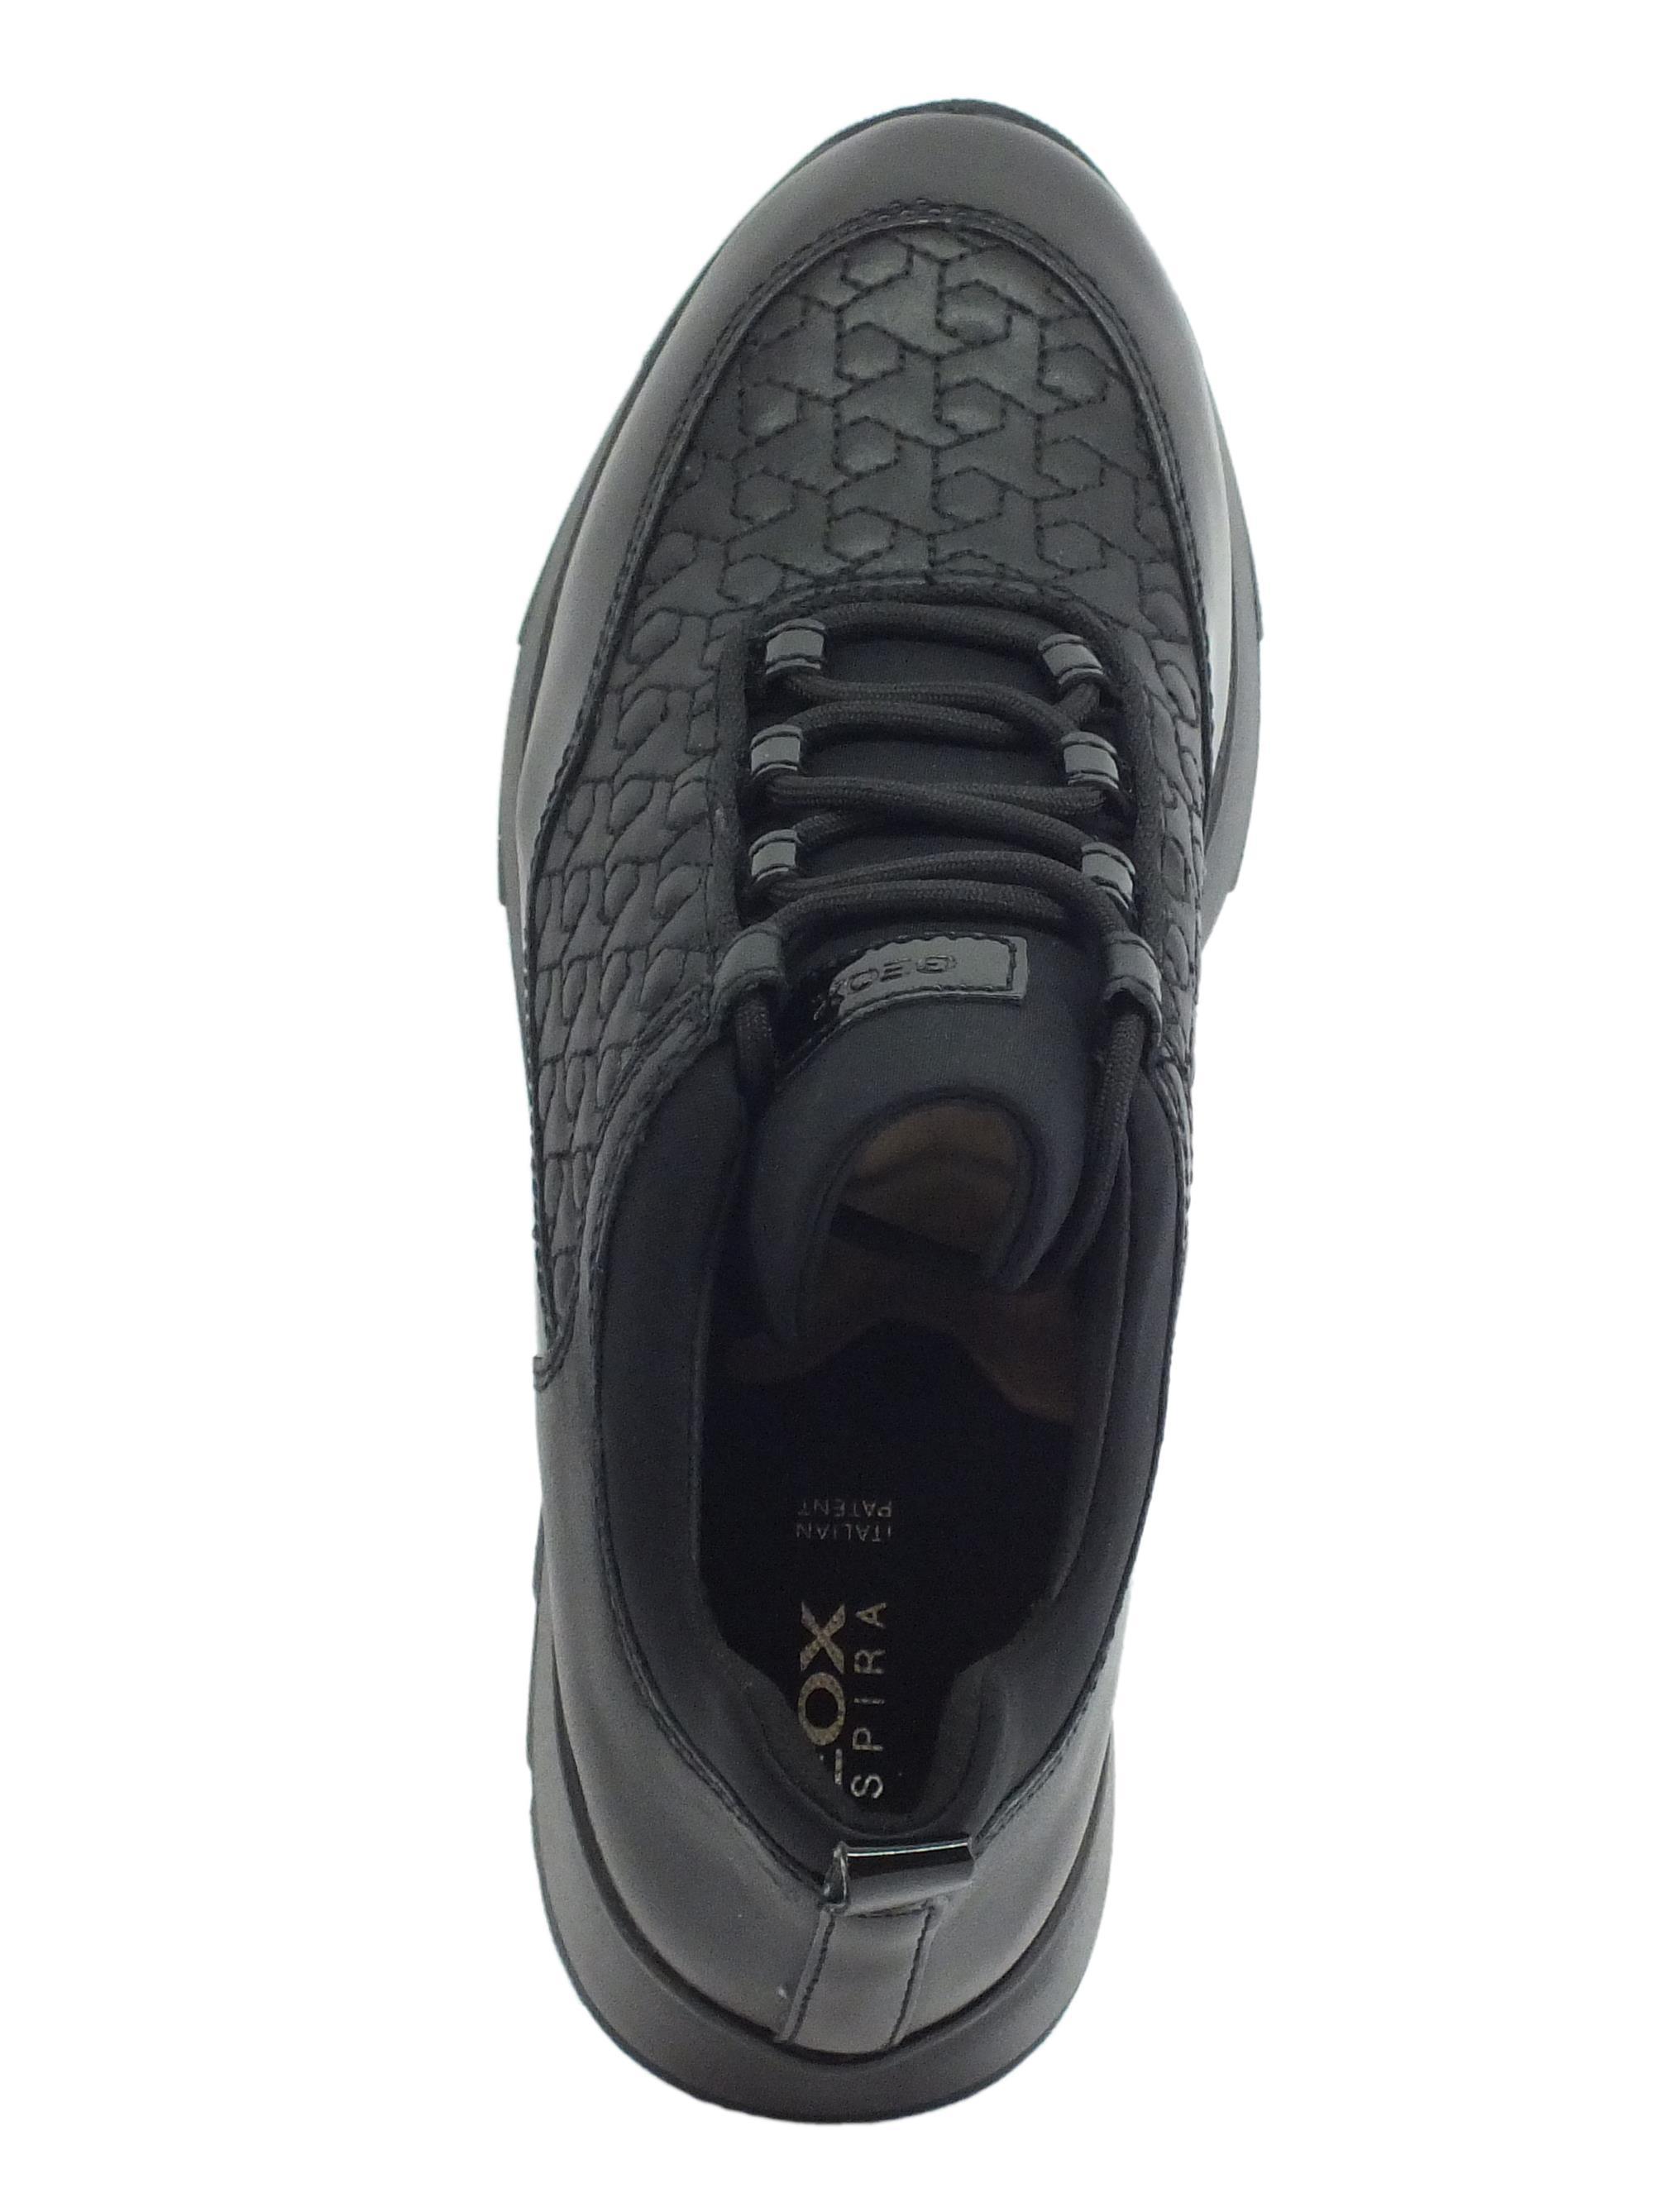 Sneakers Geox Gendry per donna in pelle e sintetico nero zeppa bassa